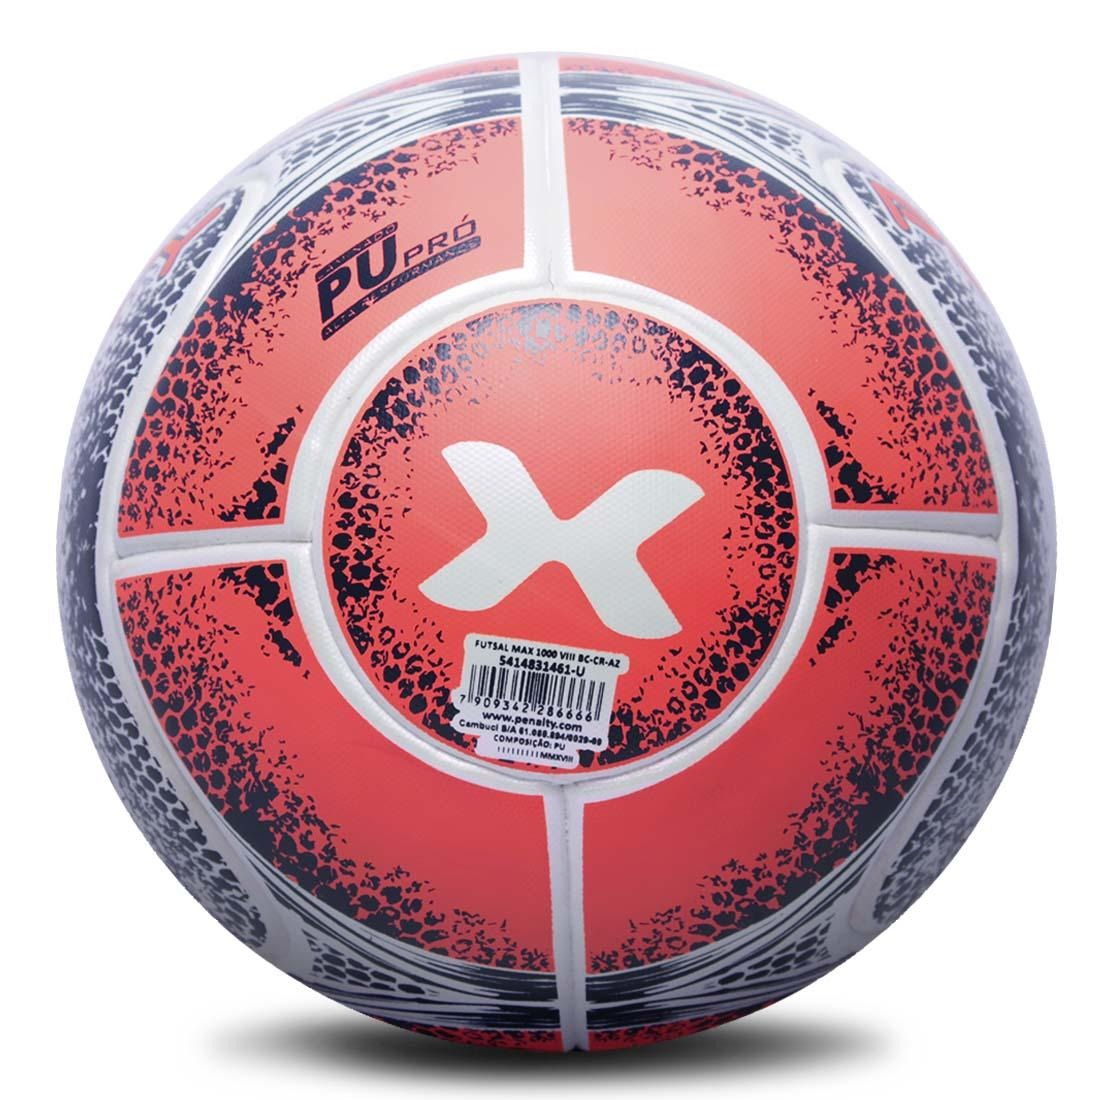 29f96d8f1bb38 bola futsal penalty max 1000 aprovada fifa 2018 na caixa. Carregando zoom.